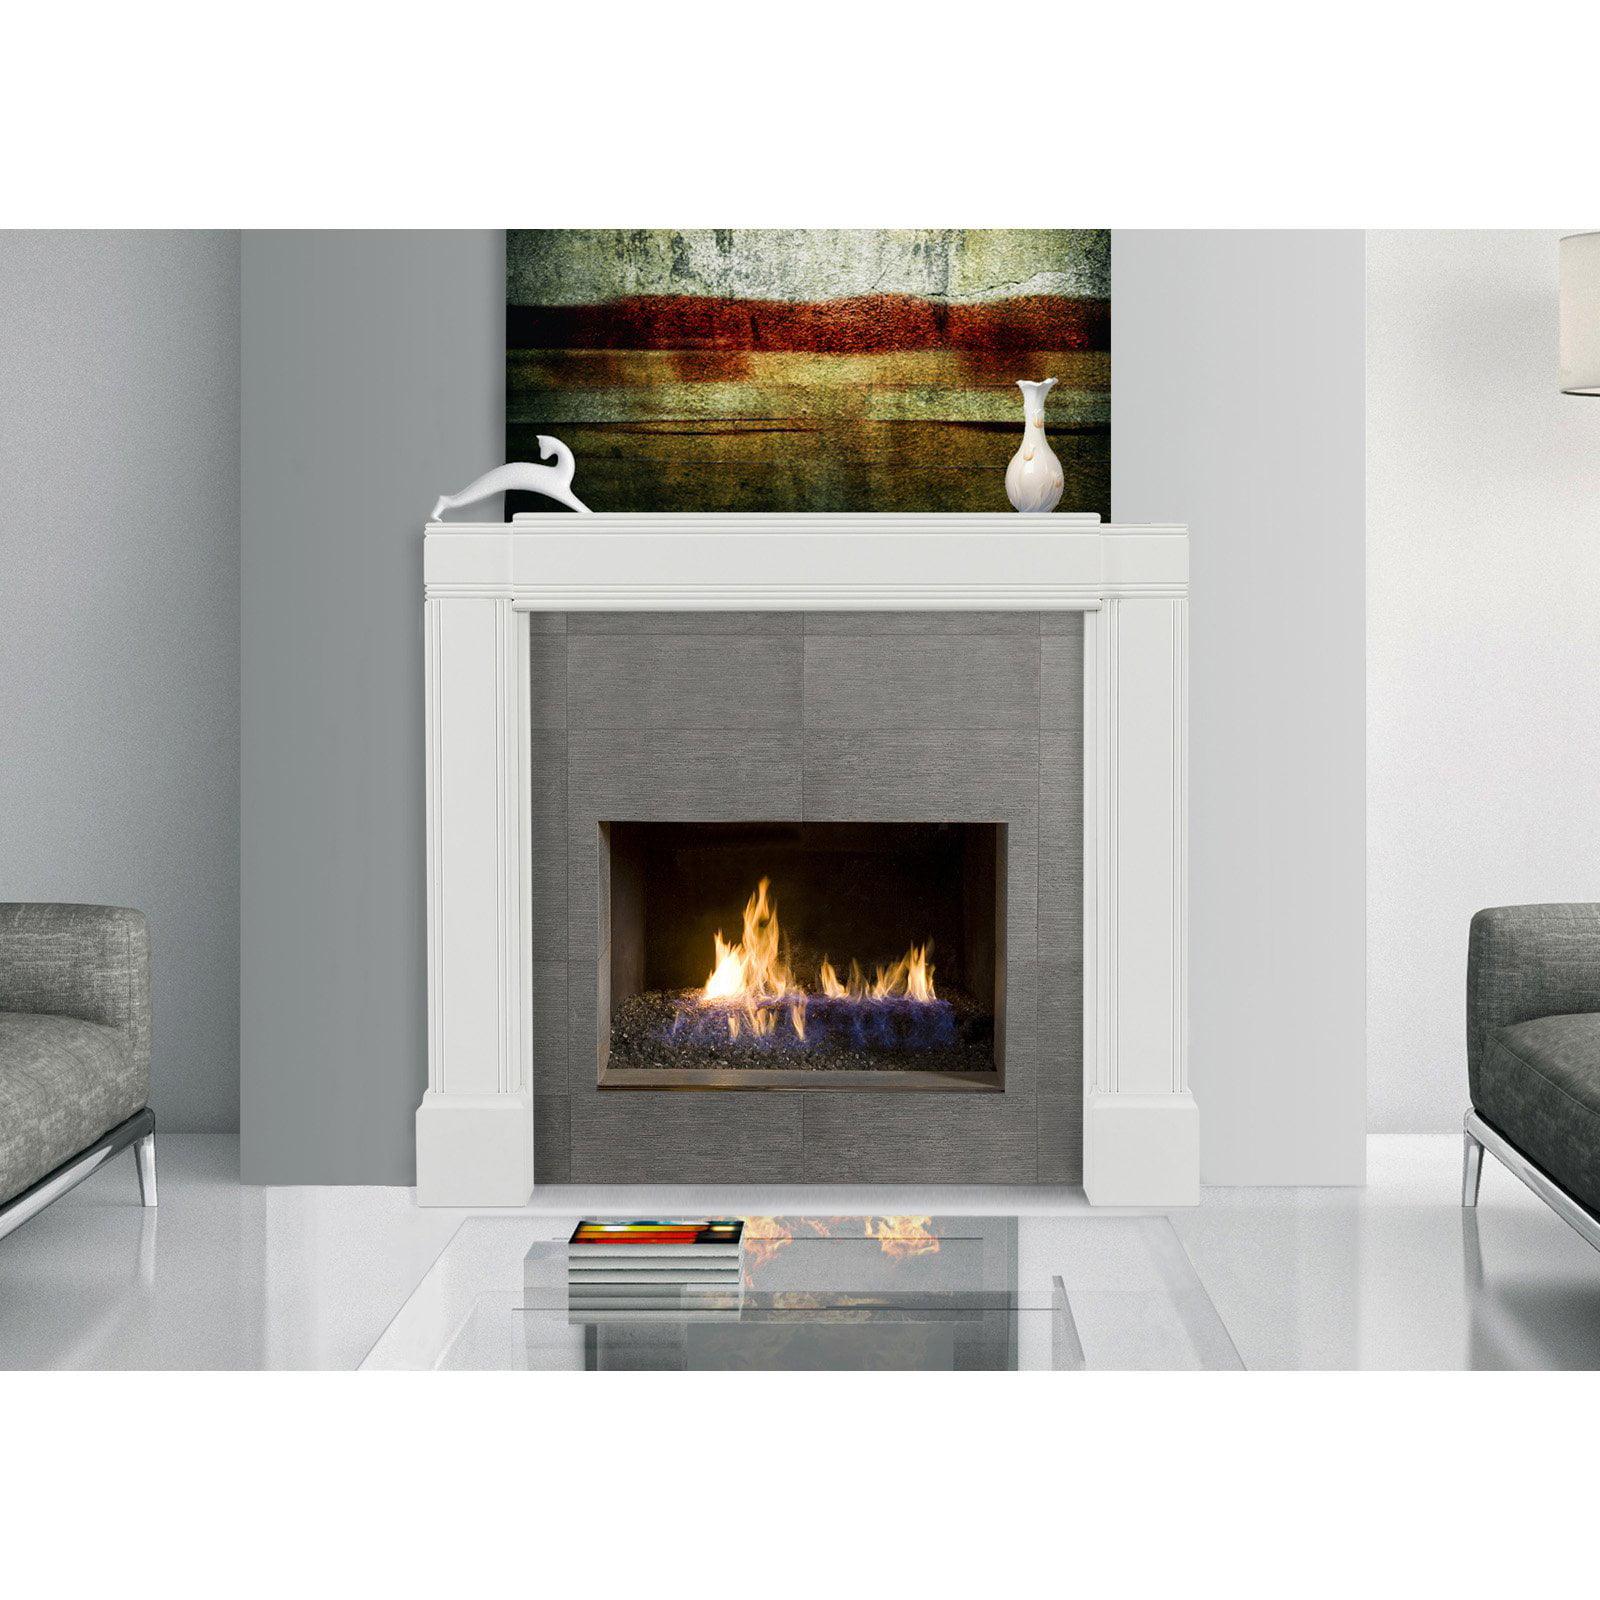 Pearls Mantels Emory Adjustable Fireplace Mantel Surround